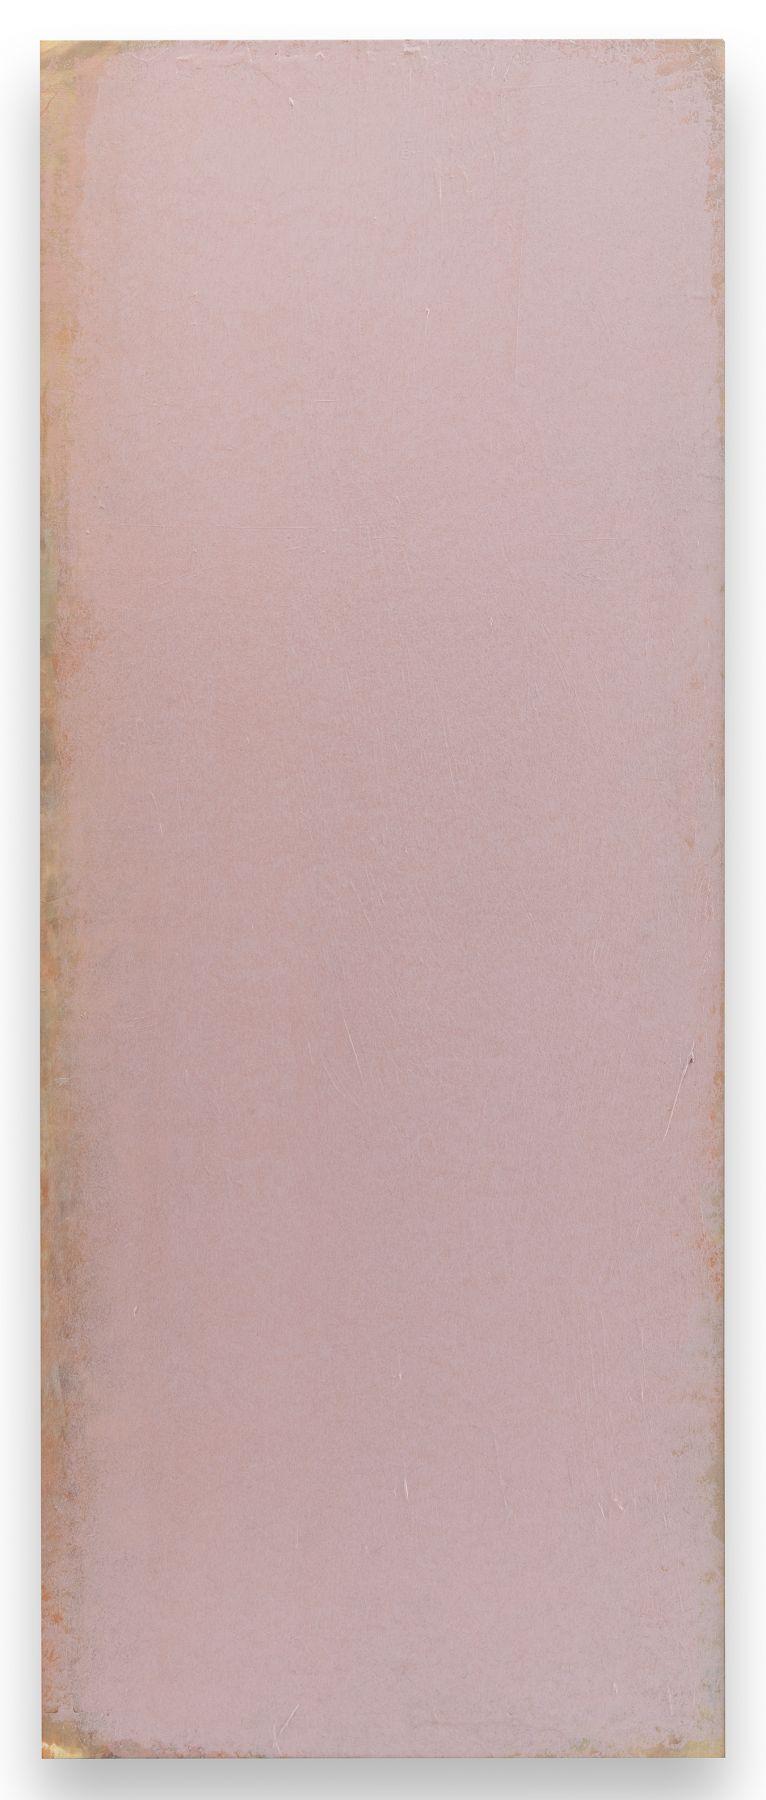 Beauty Mouth 16, 1972, Acrylic on canvas